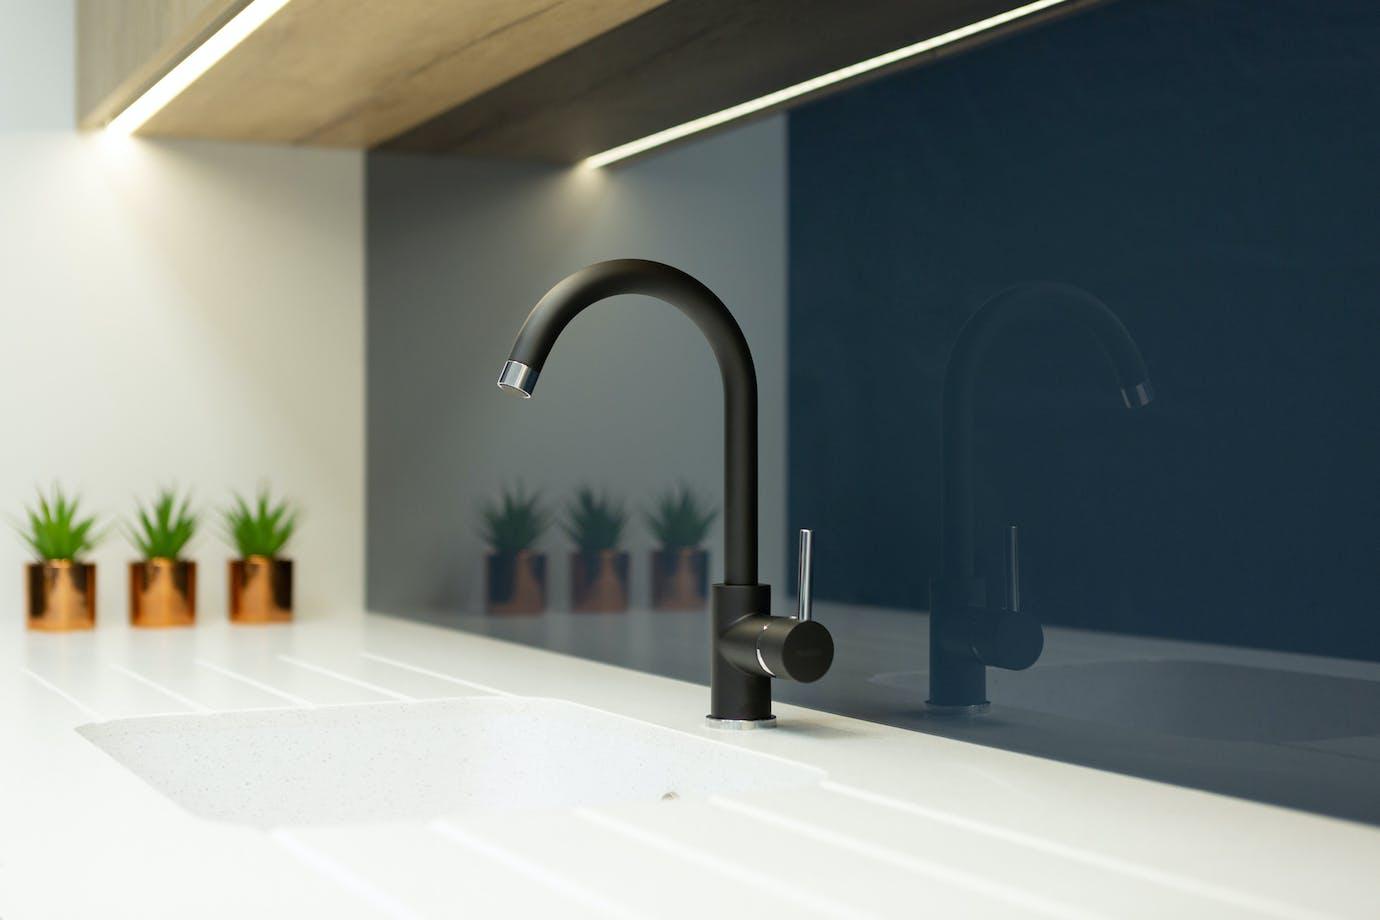 Studio Display - Blanco Maple Suede Finish